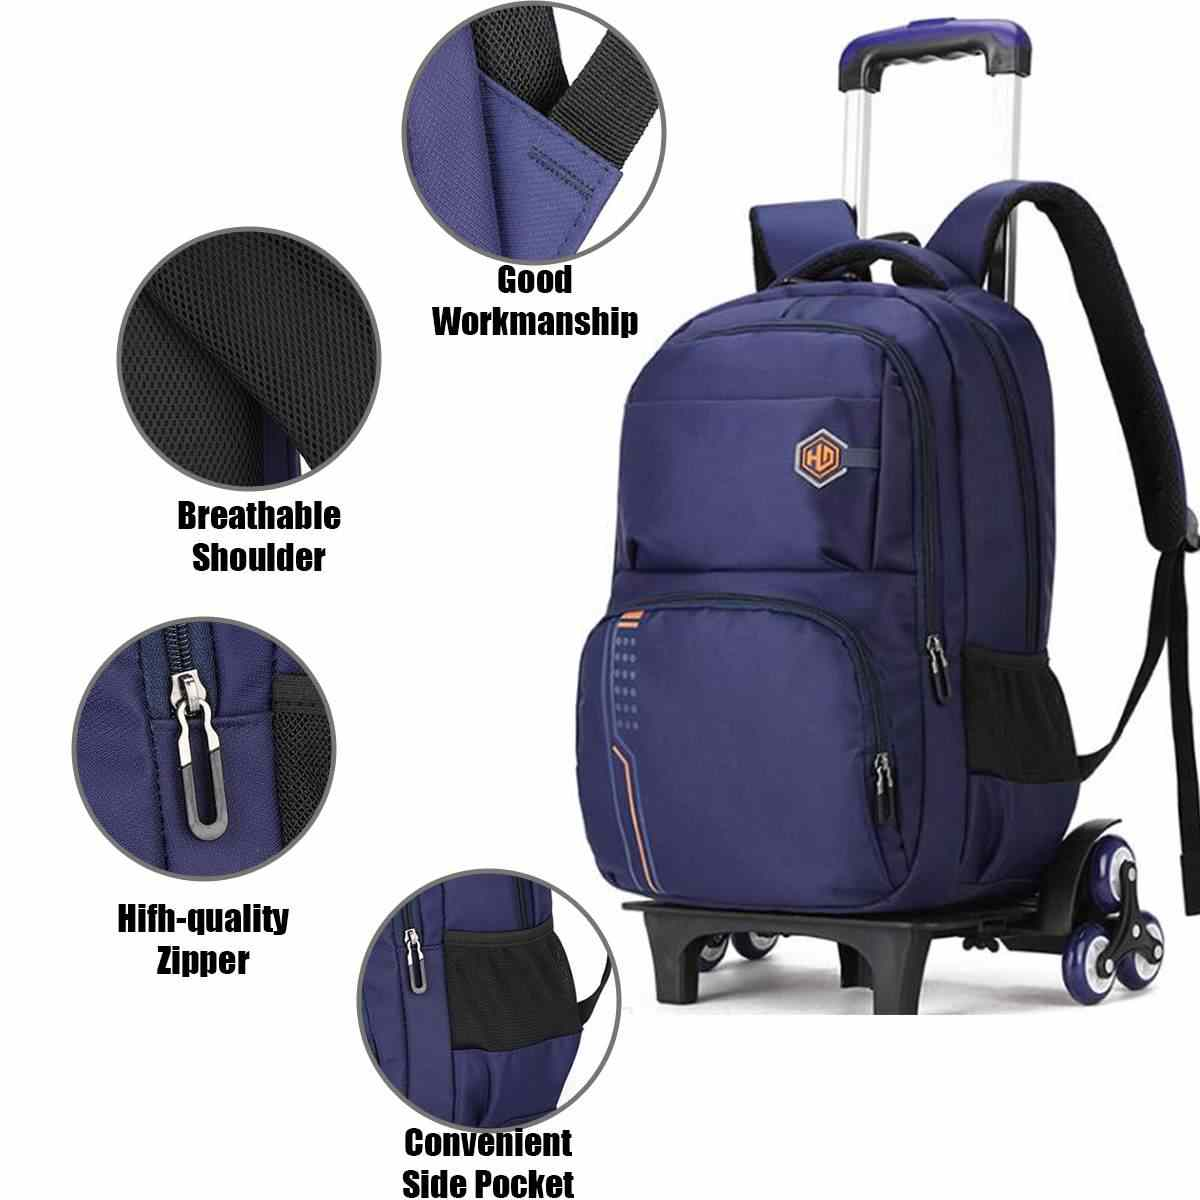 2/6 Wheels Travel Rolling Luggage Bag School Trolley Backpack For Boys Backpack On Wheels Kid's Trolley School wheeled Backpack